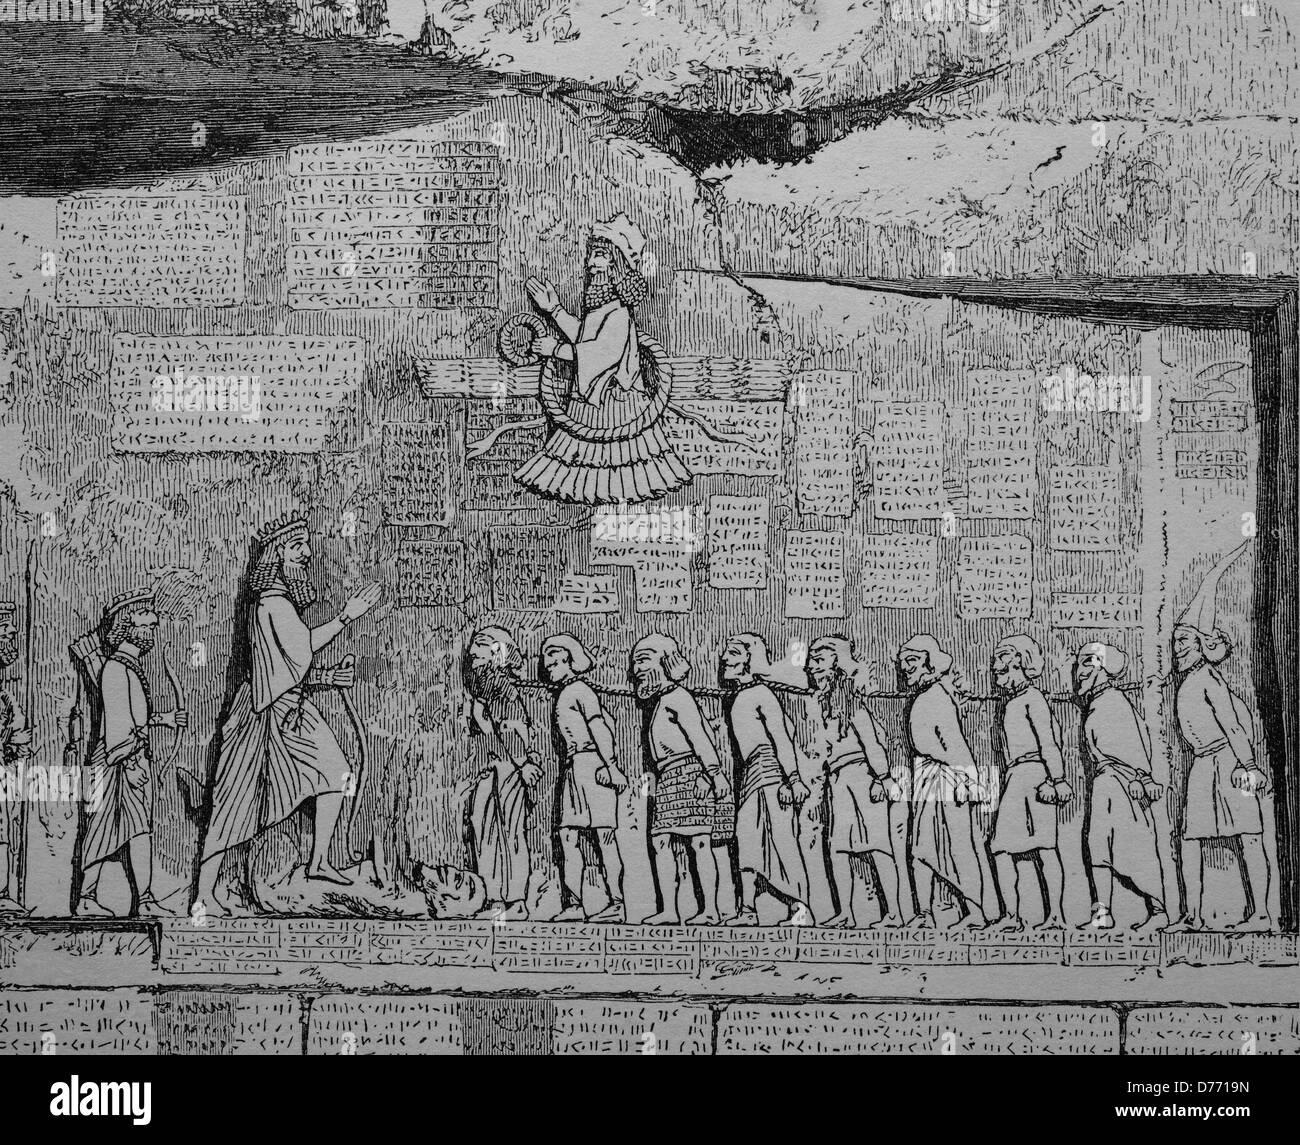 Behistun Inscription, relief with an inscription about Darius I, Bistun in Kermanshah, Iran, woodcut from 1880 - Stock Image